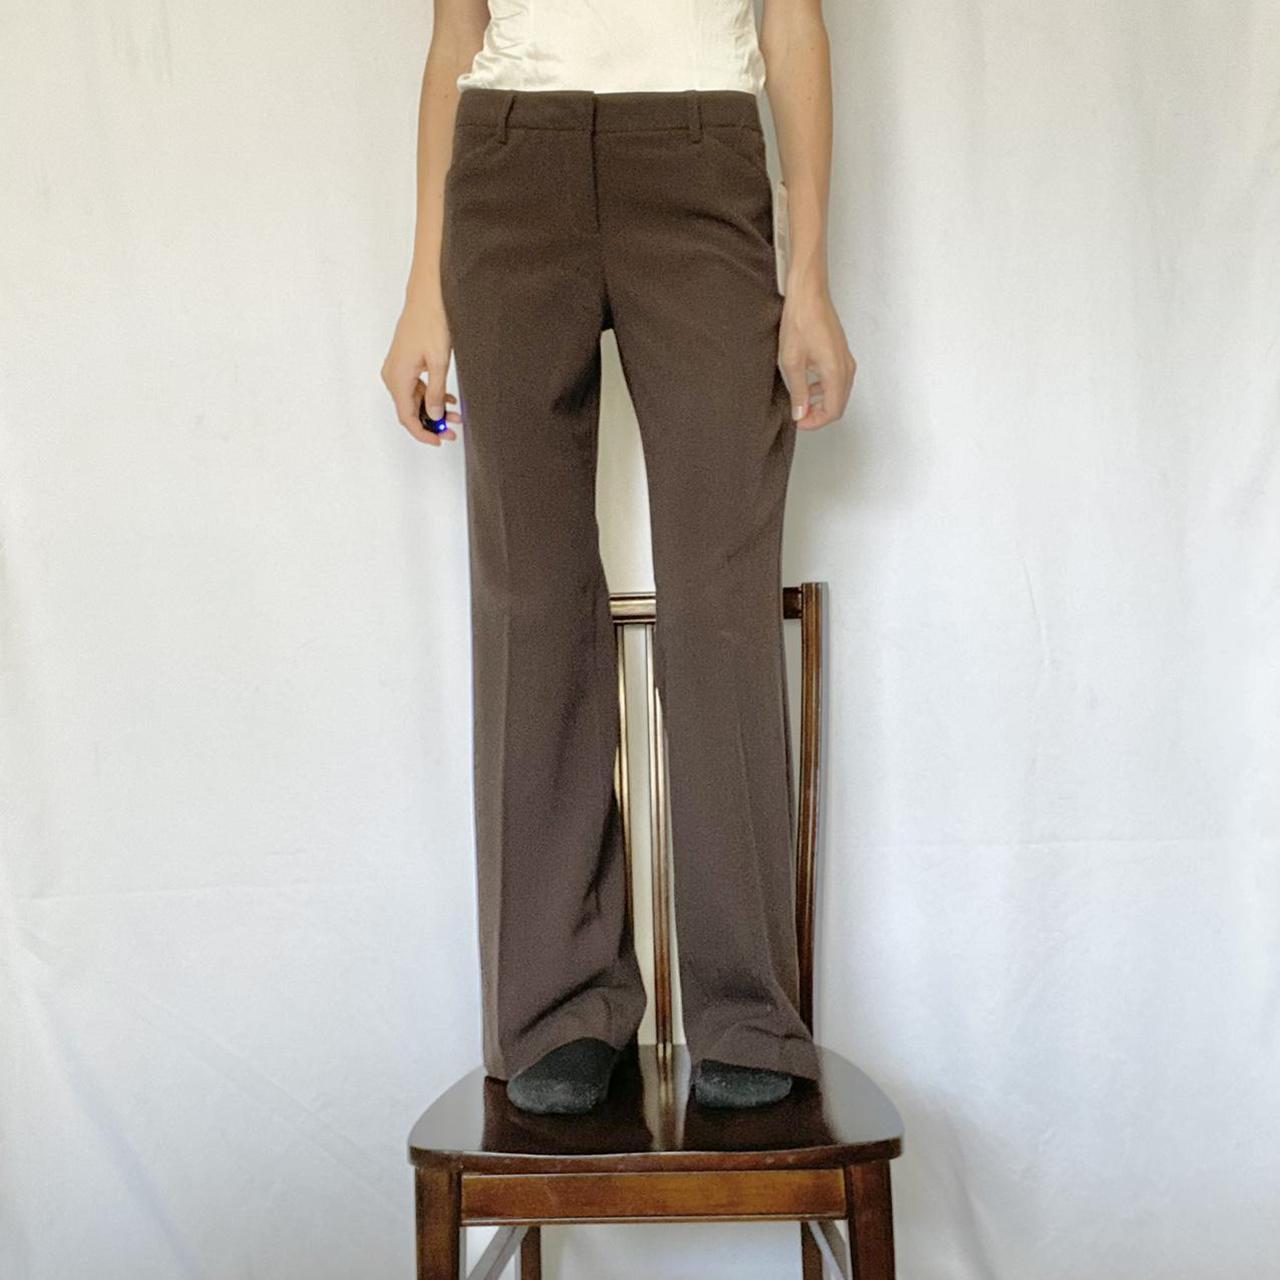 Product Image 1 - ☆ VINTAGE DRESS PANTS ☆  obsessed